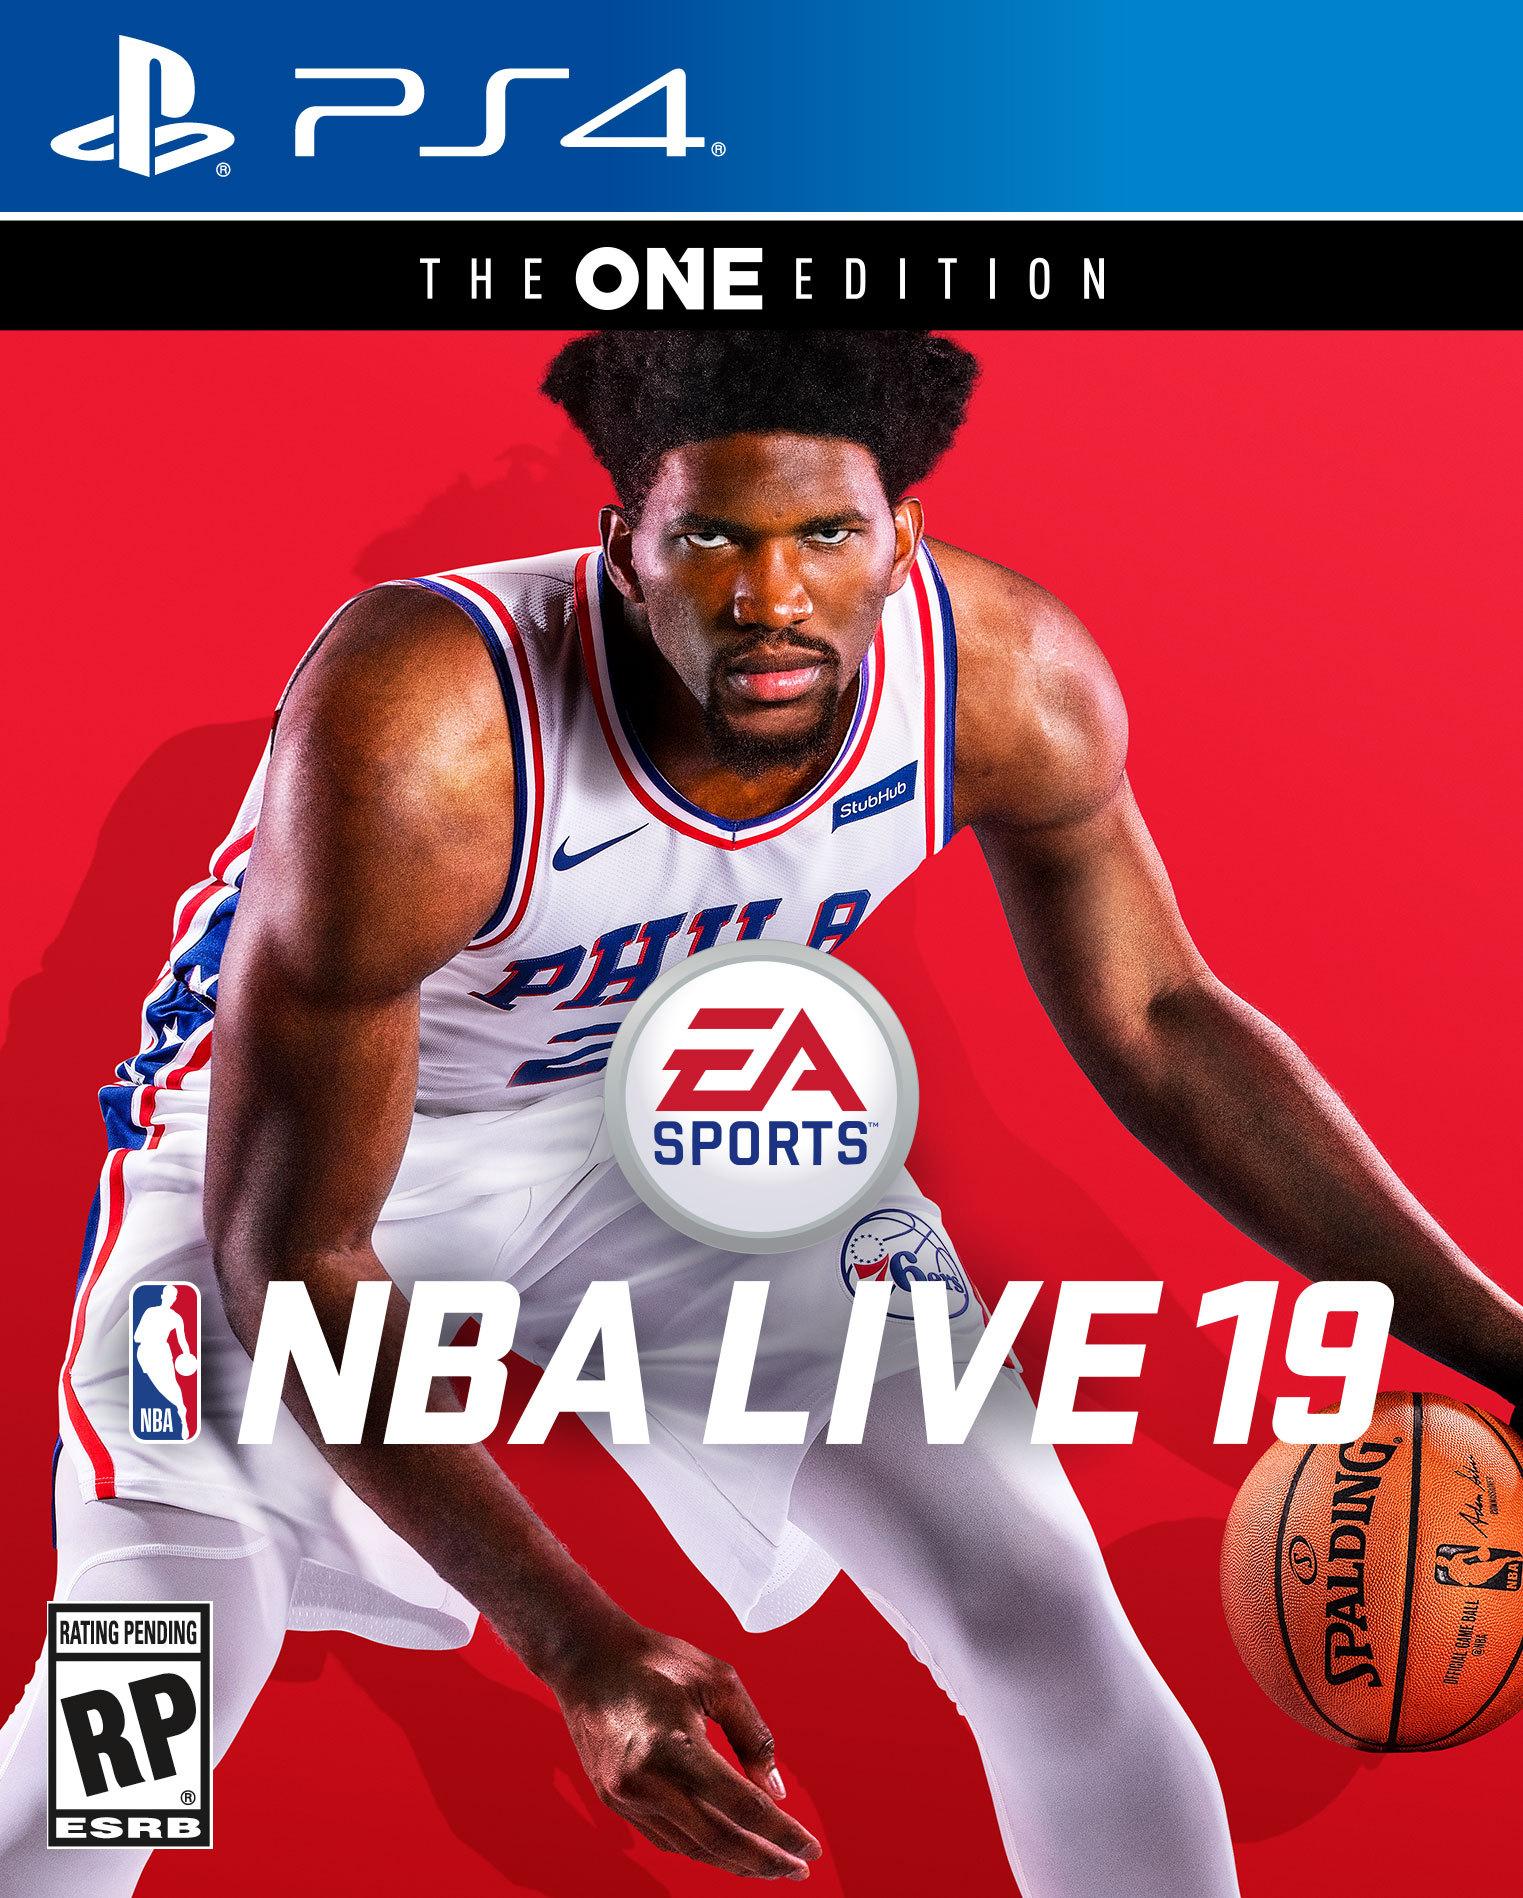 NBA Live Joël Embiid cover